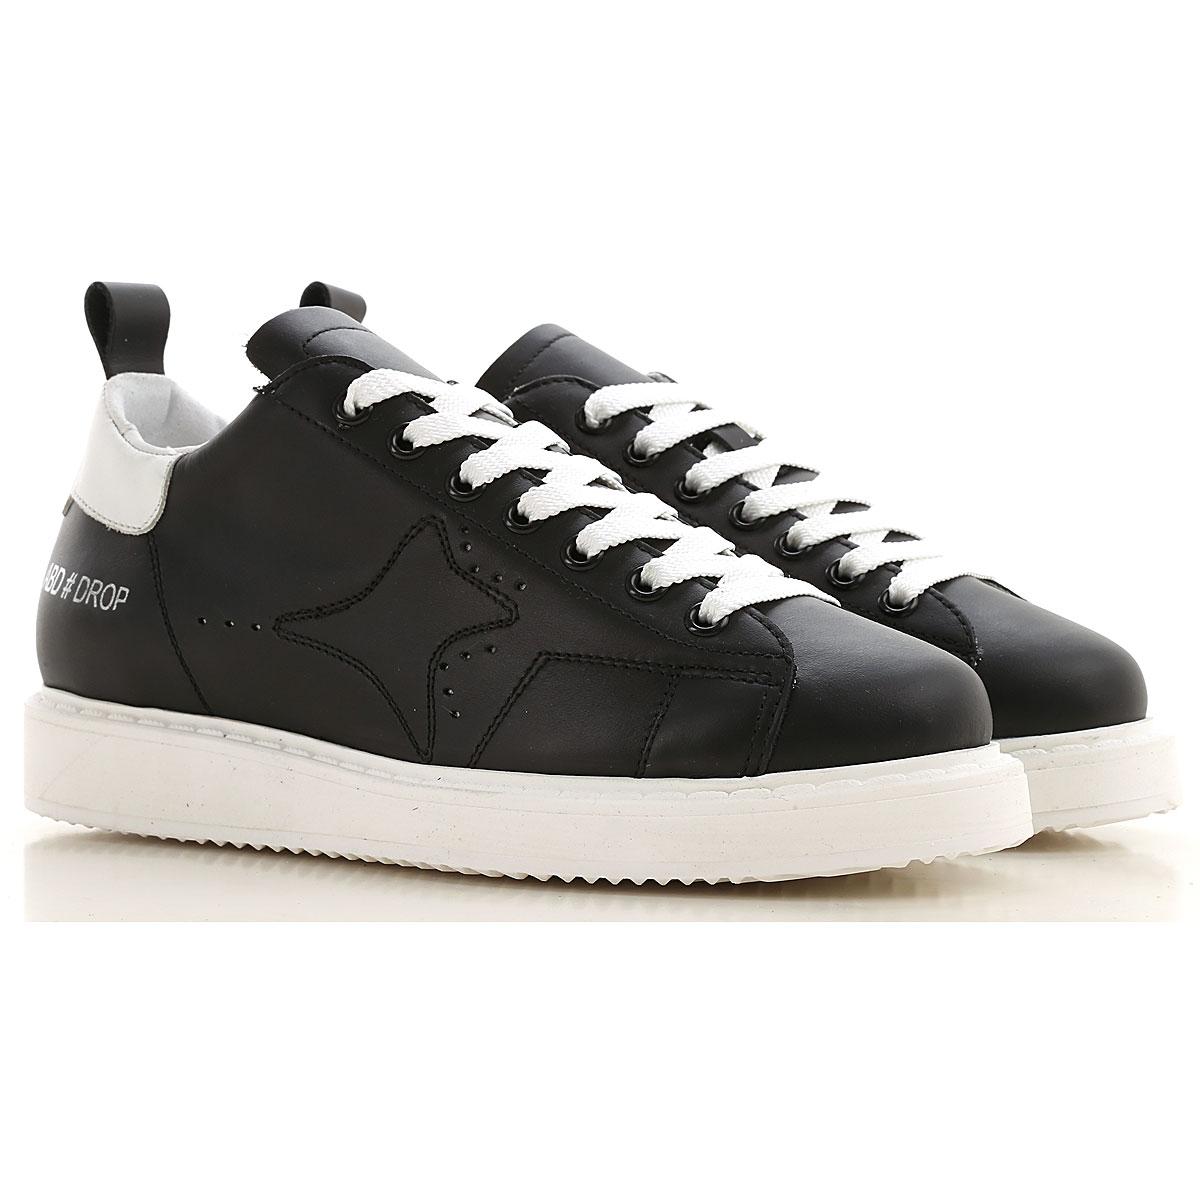 Ama Brand Sneakers for Women, Black, Leather, 2019, EUR 36 - UK 3 - USA 5.5 EUR 37 - UK 4 - USA 6.5